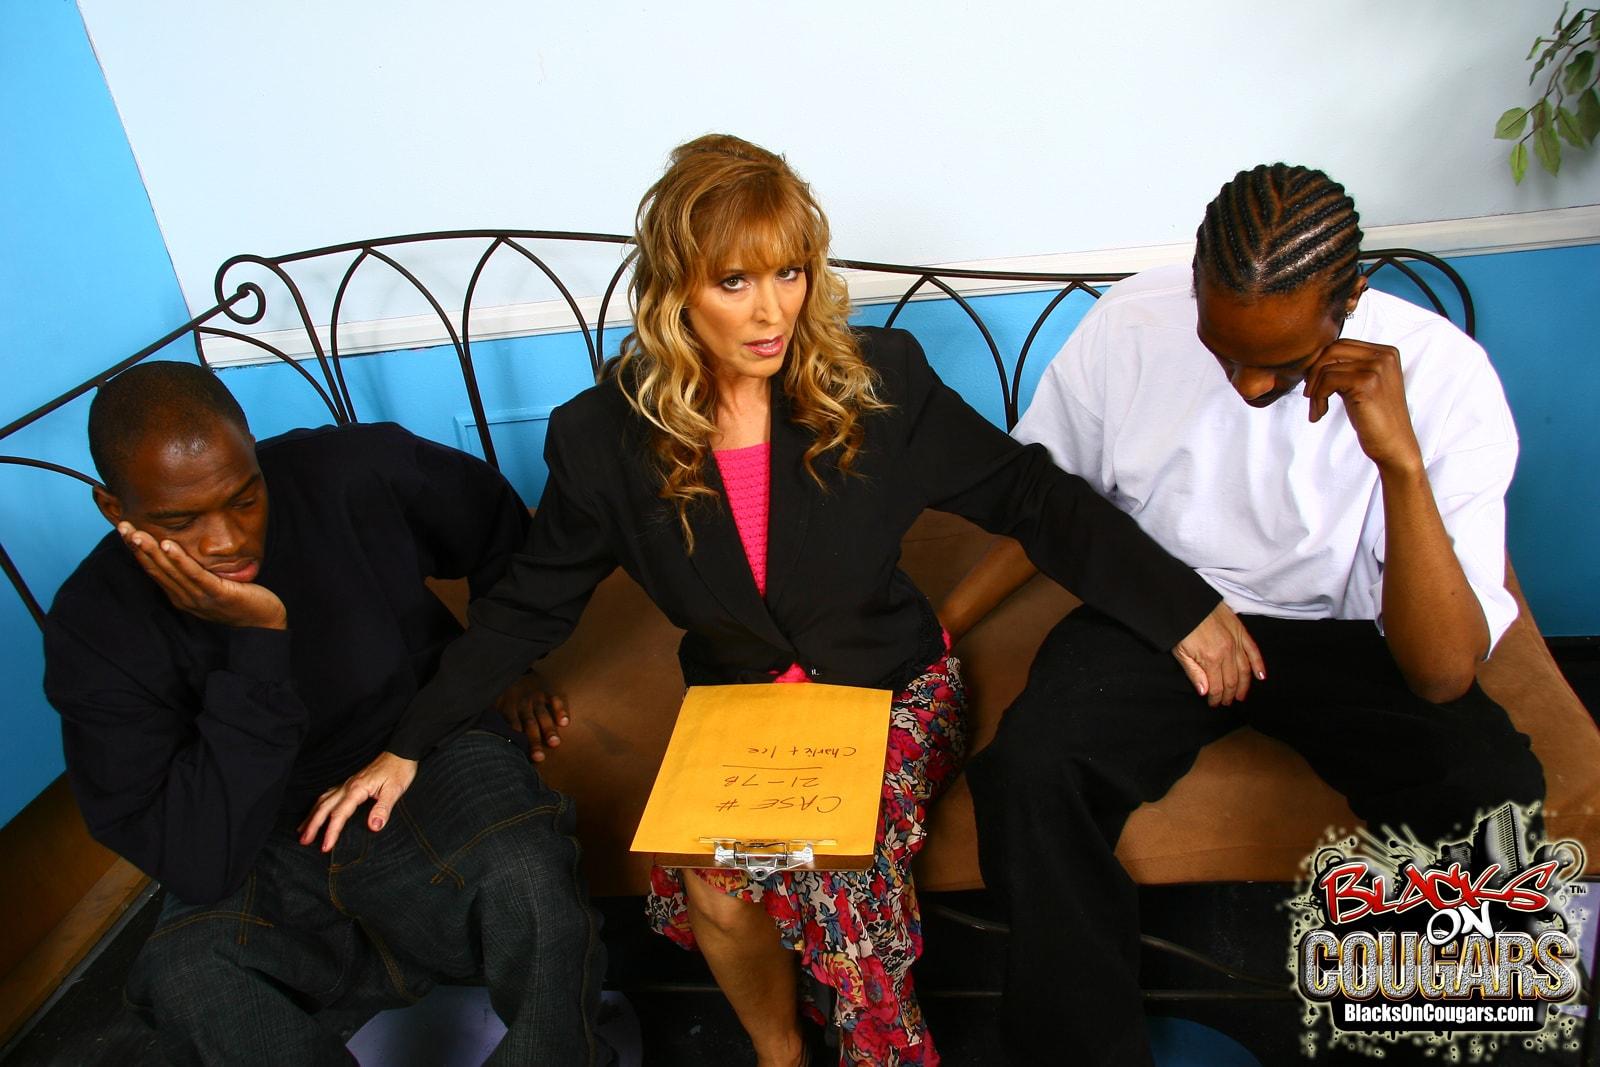 Dogfart '- Blacks On Cougars' starring Nicole Moore (Photo 4)